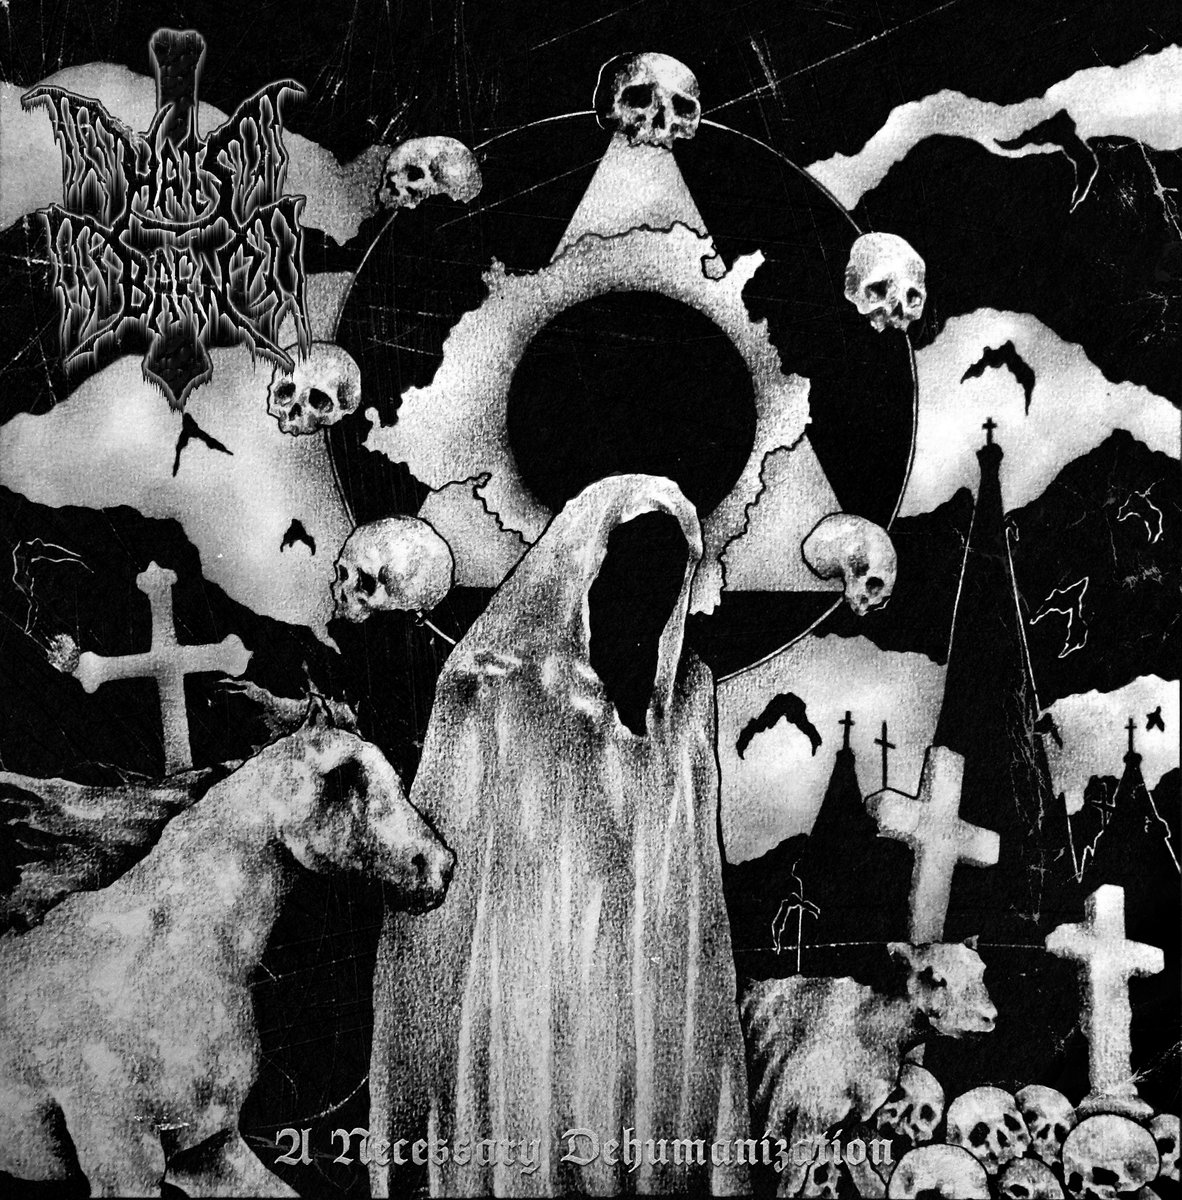 hats barn true black metal de lille interview avec le scribe du rock